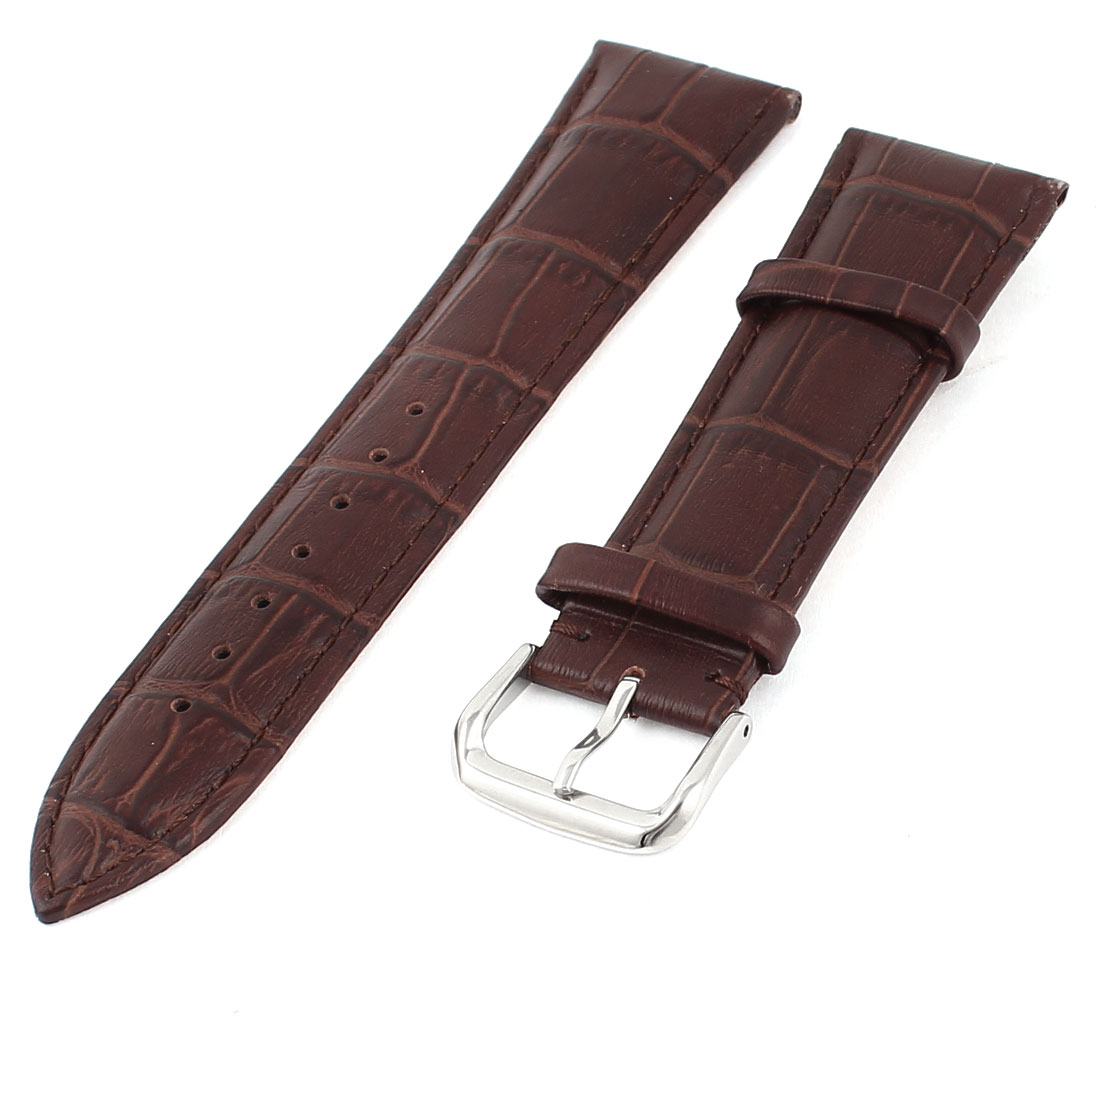 Faux Leather Adjustable Watch Band Belt Bracelet Strap Brown